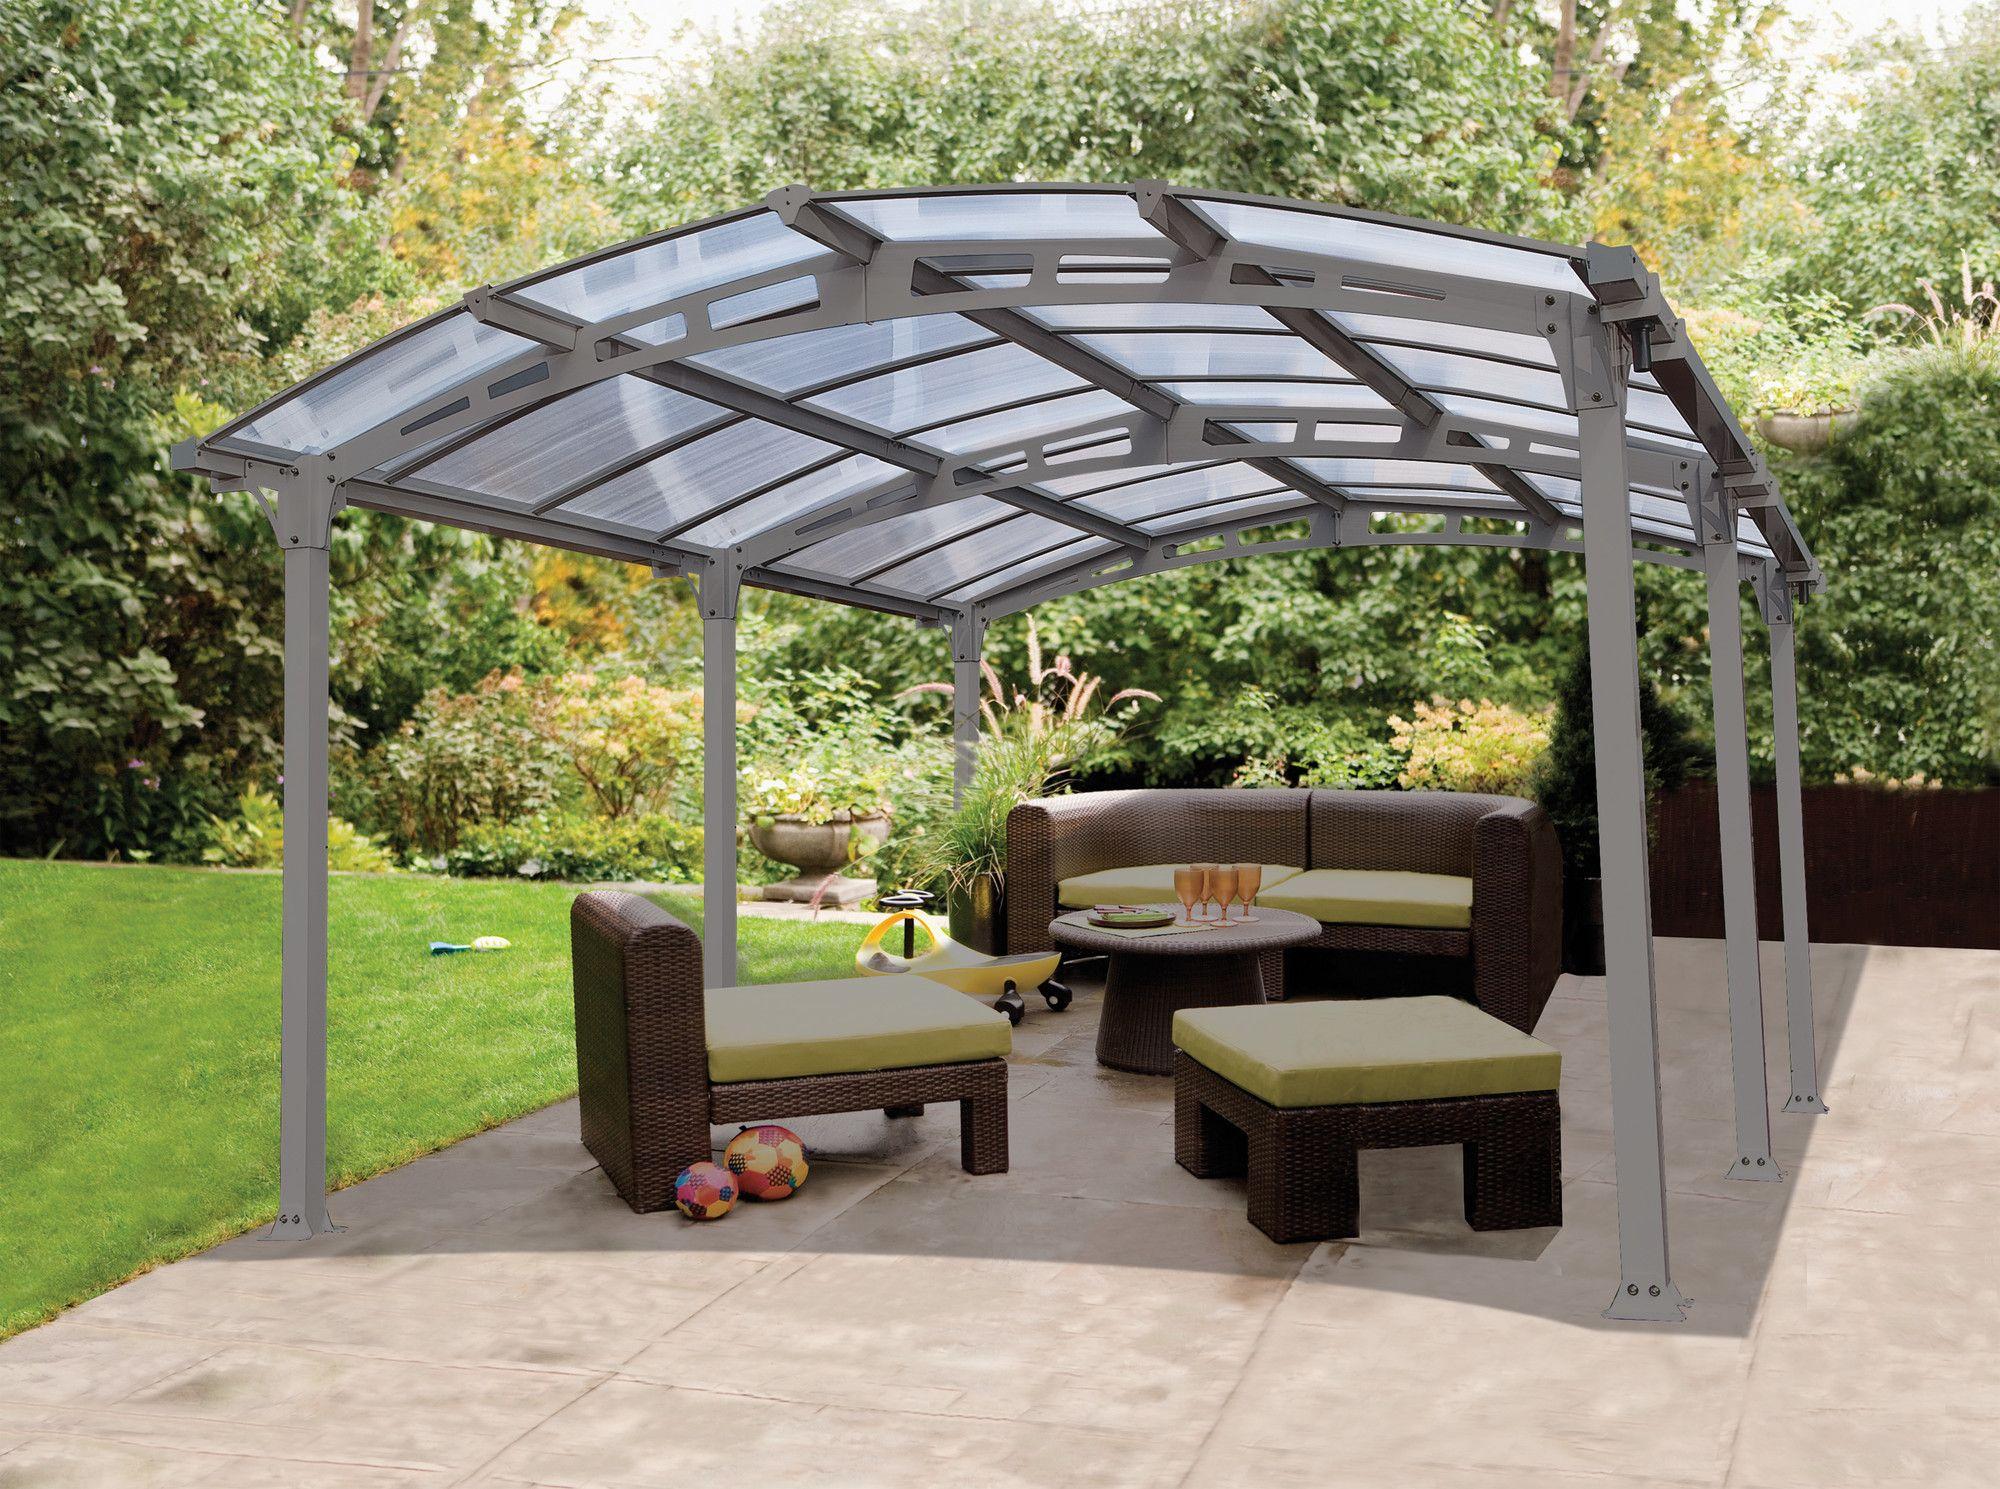 Canopy garage door kit - Very Interesting Carport Canopy For Your Exterior Home Ideas Carport Canopy With Arcadia Carport Patio